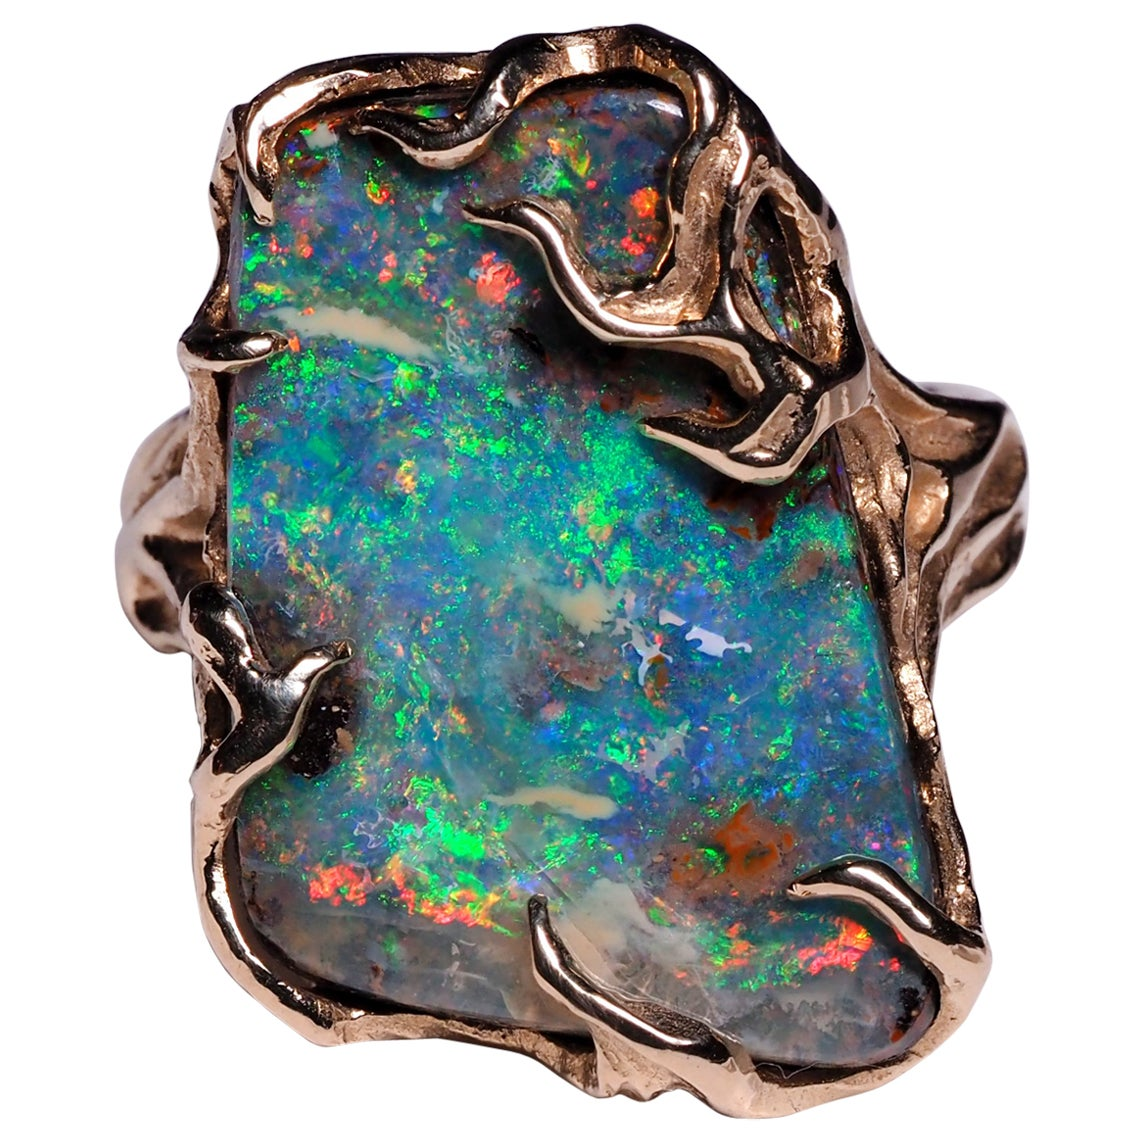 Boulder Opal Ring 14 Karat Gold Art Nouveau Christmas gift Unisex jewelry Mens